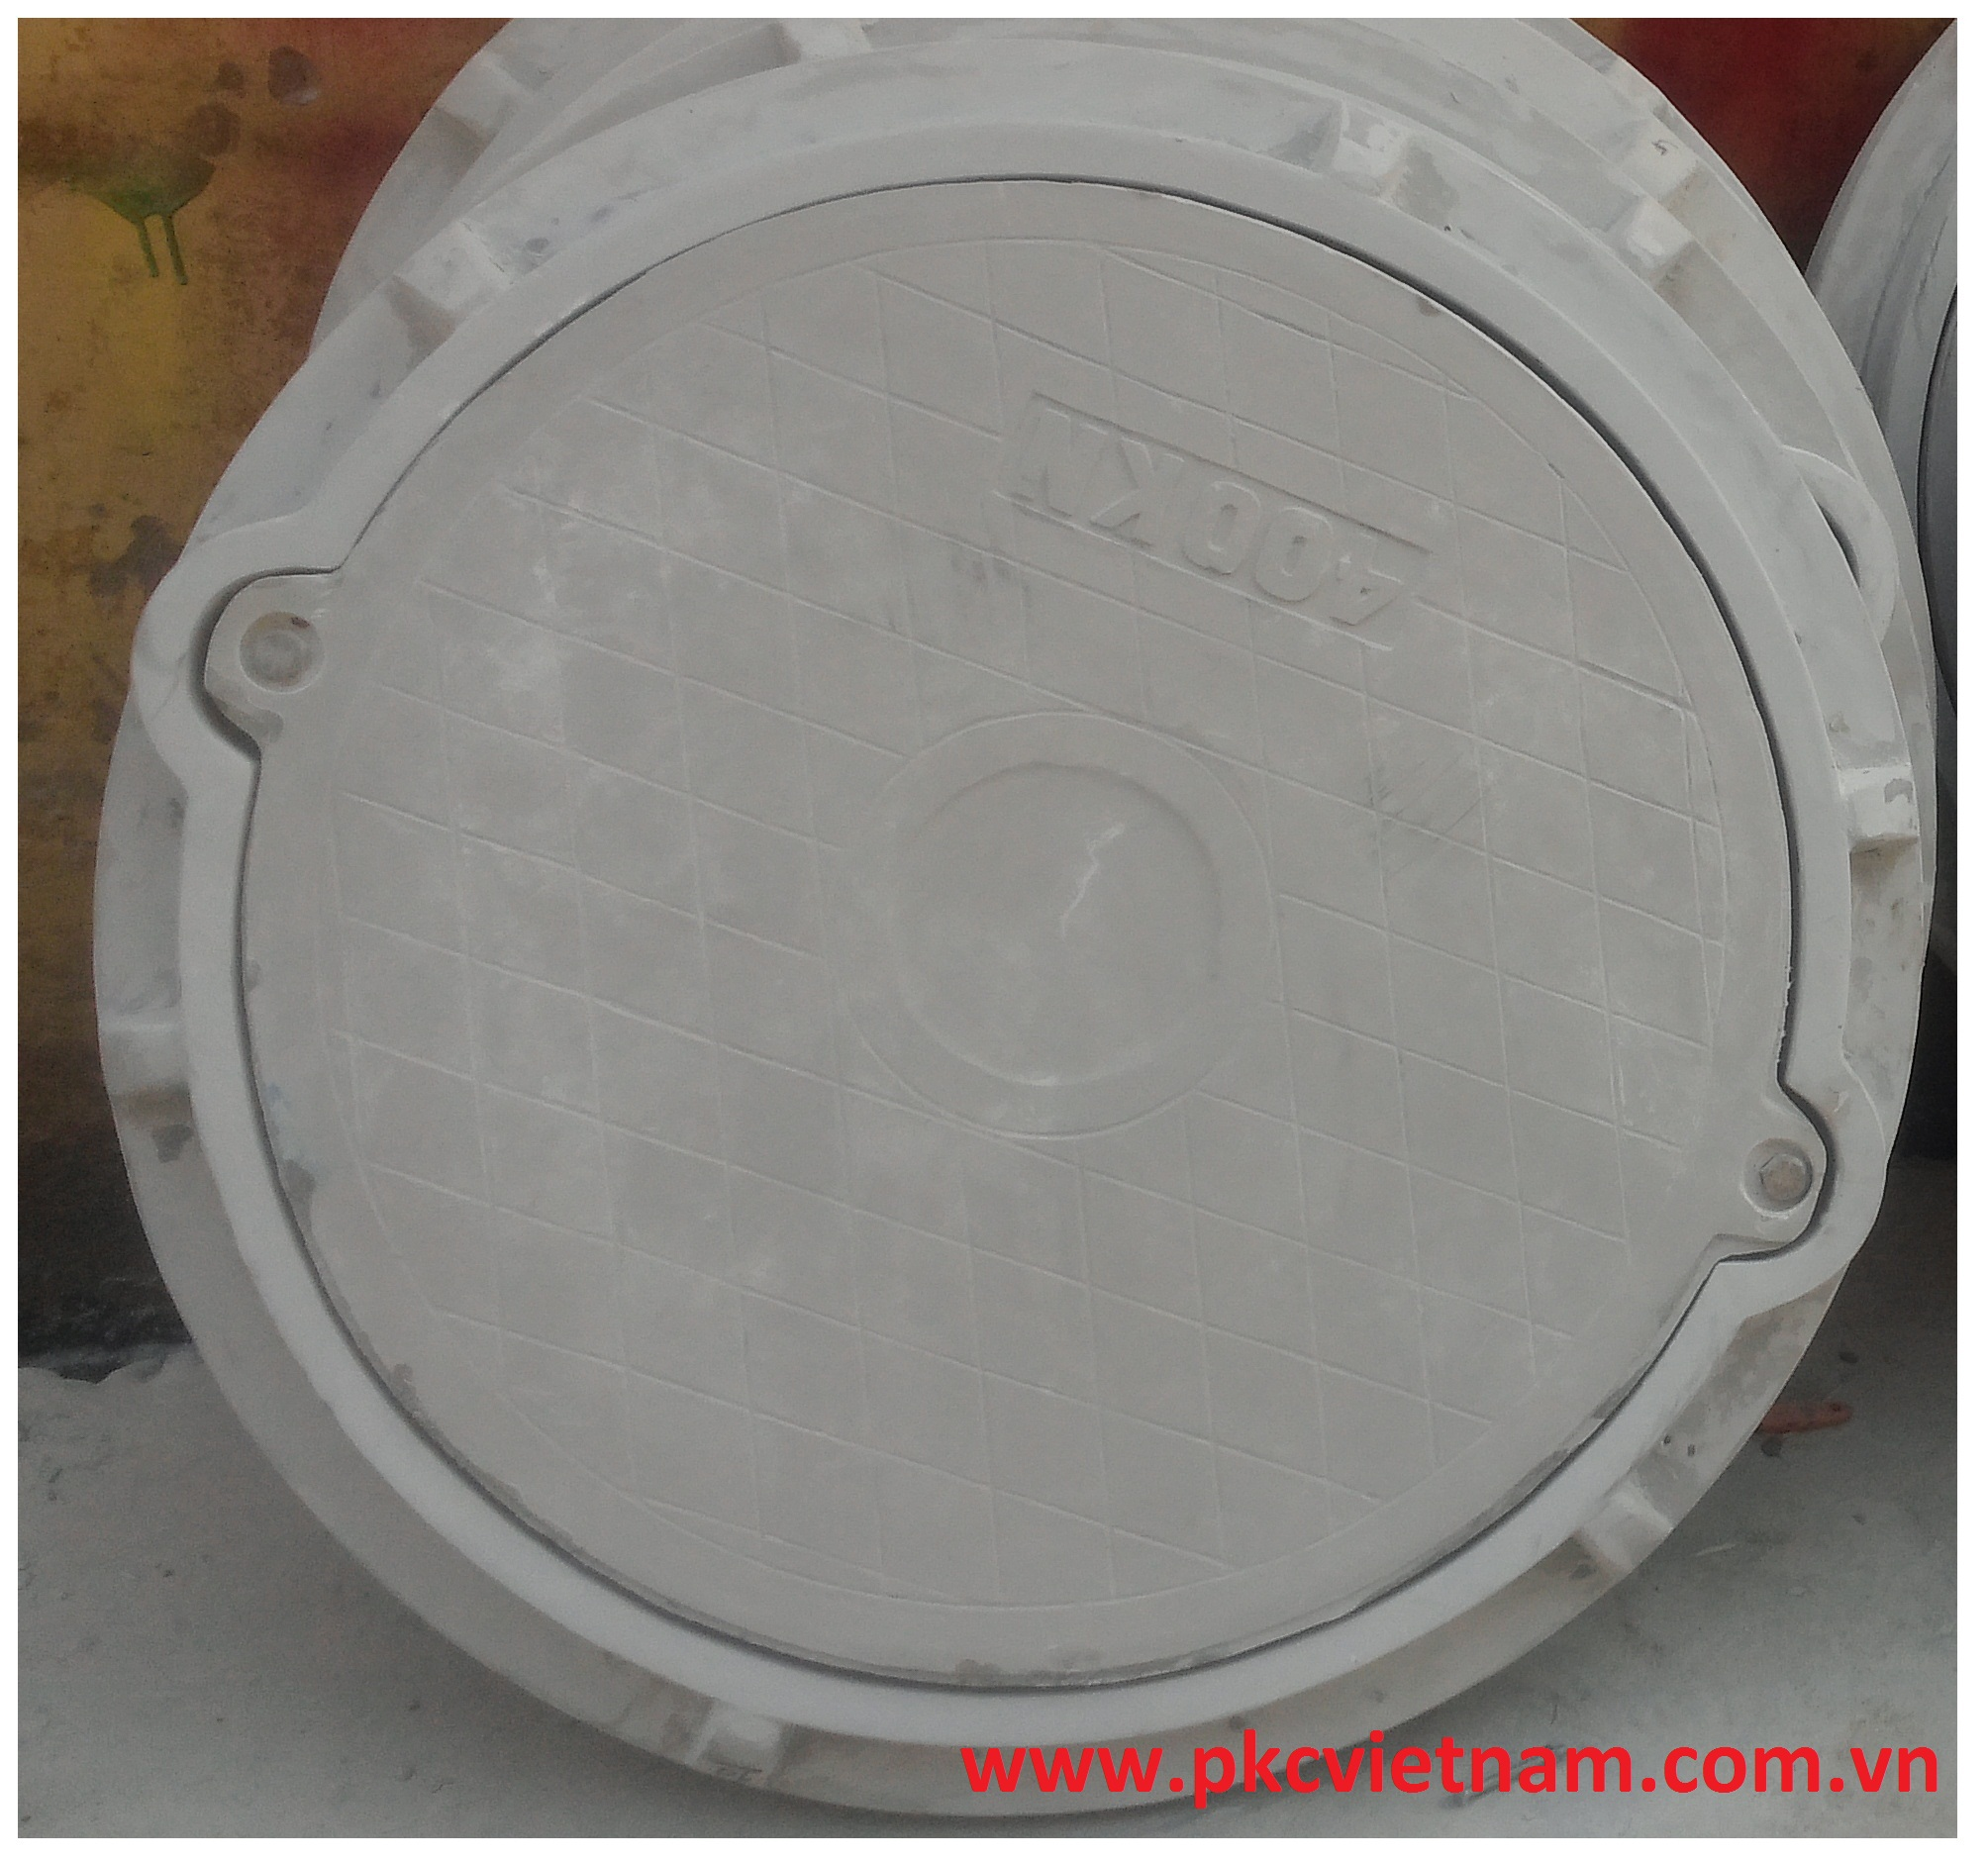 https://pkcvietnam.com.vn/san-pham/nap-ho-ga-khung-tron-nap-tron-composite-850x650